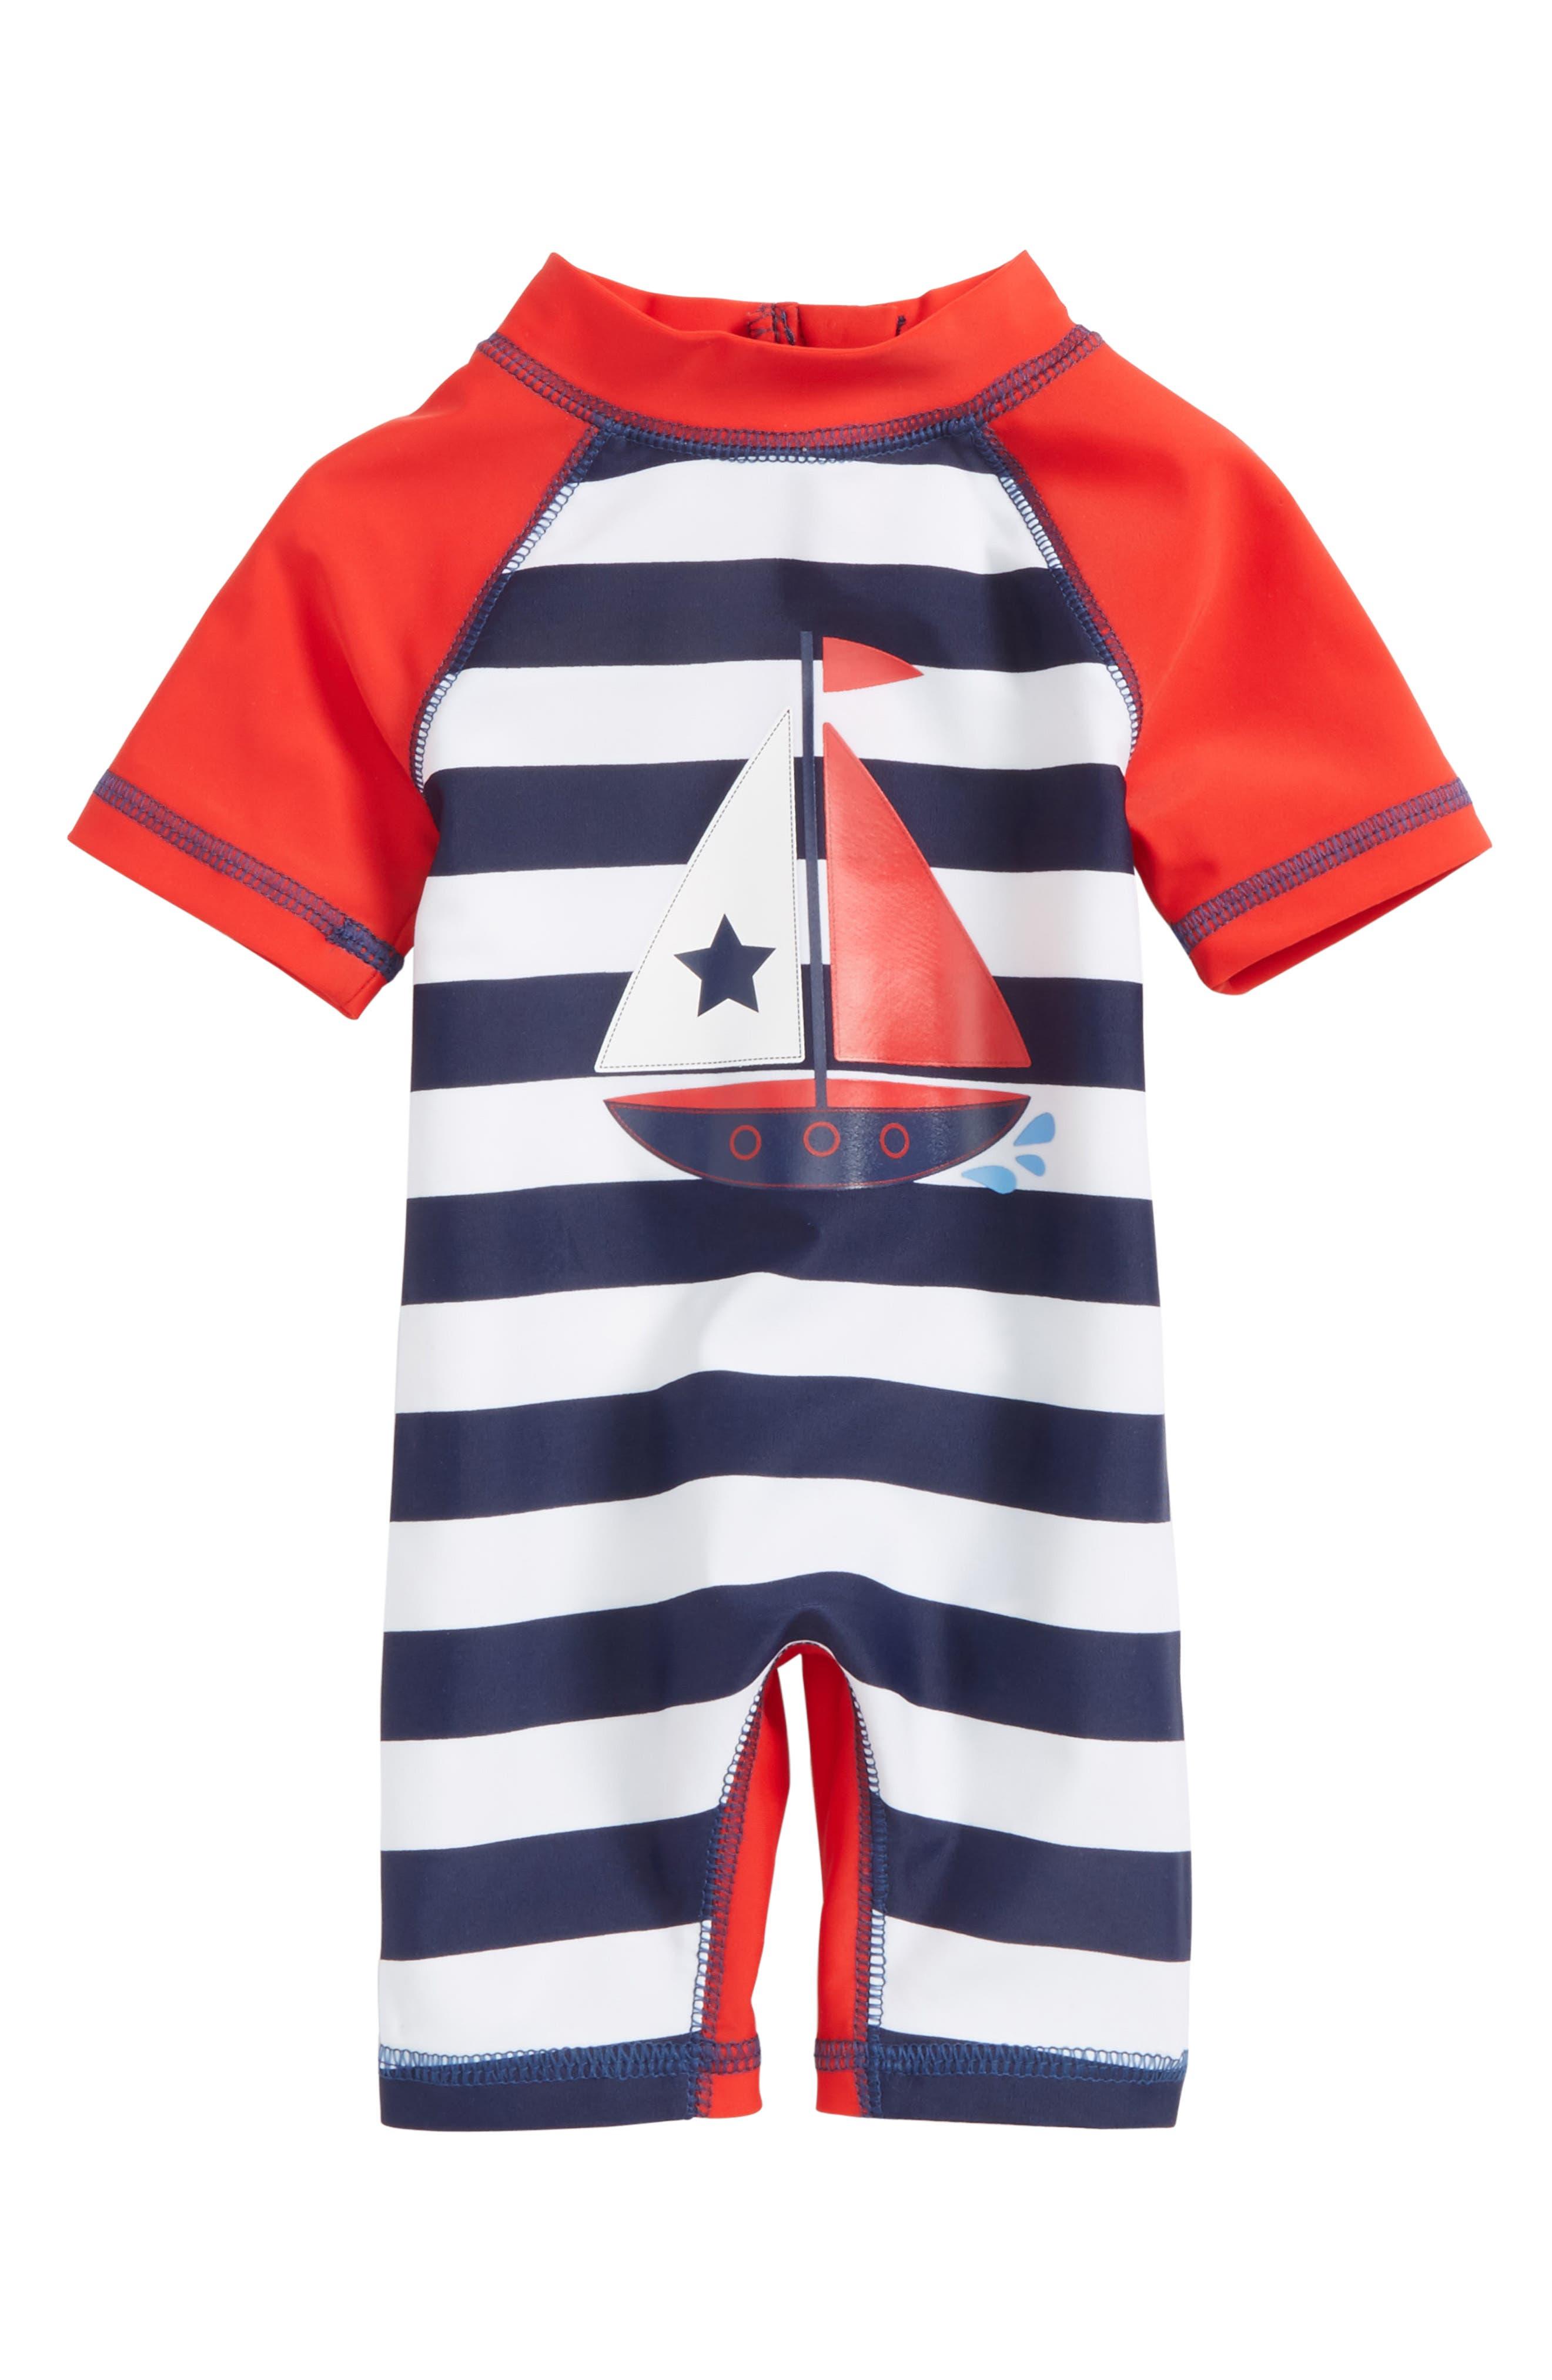 Sailboat UPF 50+ One-Piece Rashguard Swimsuit,                         Main,                         color, Navy/ White